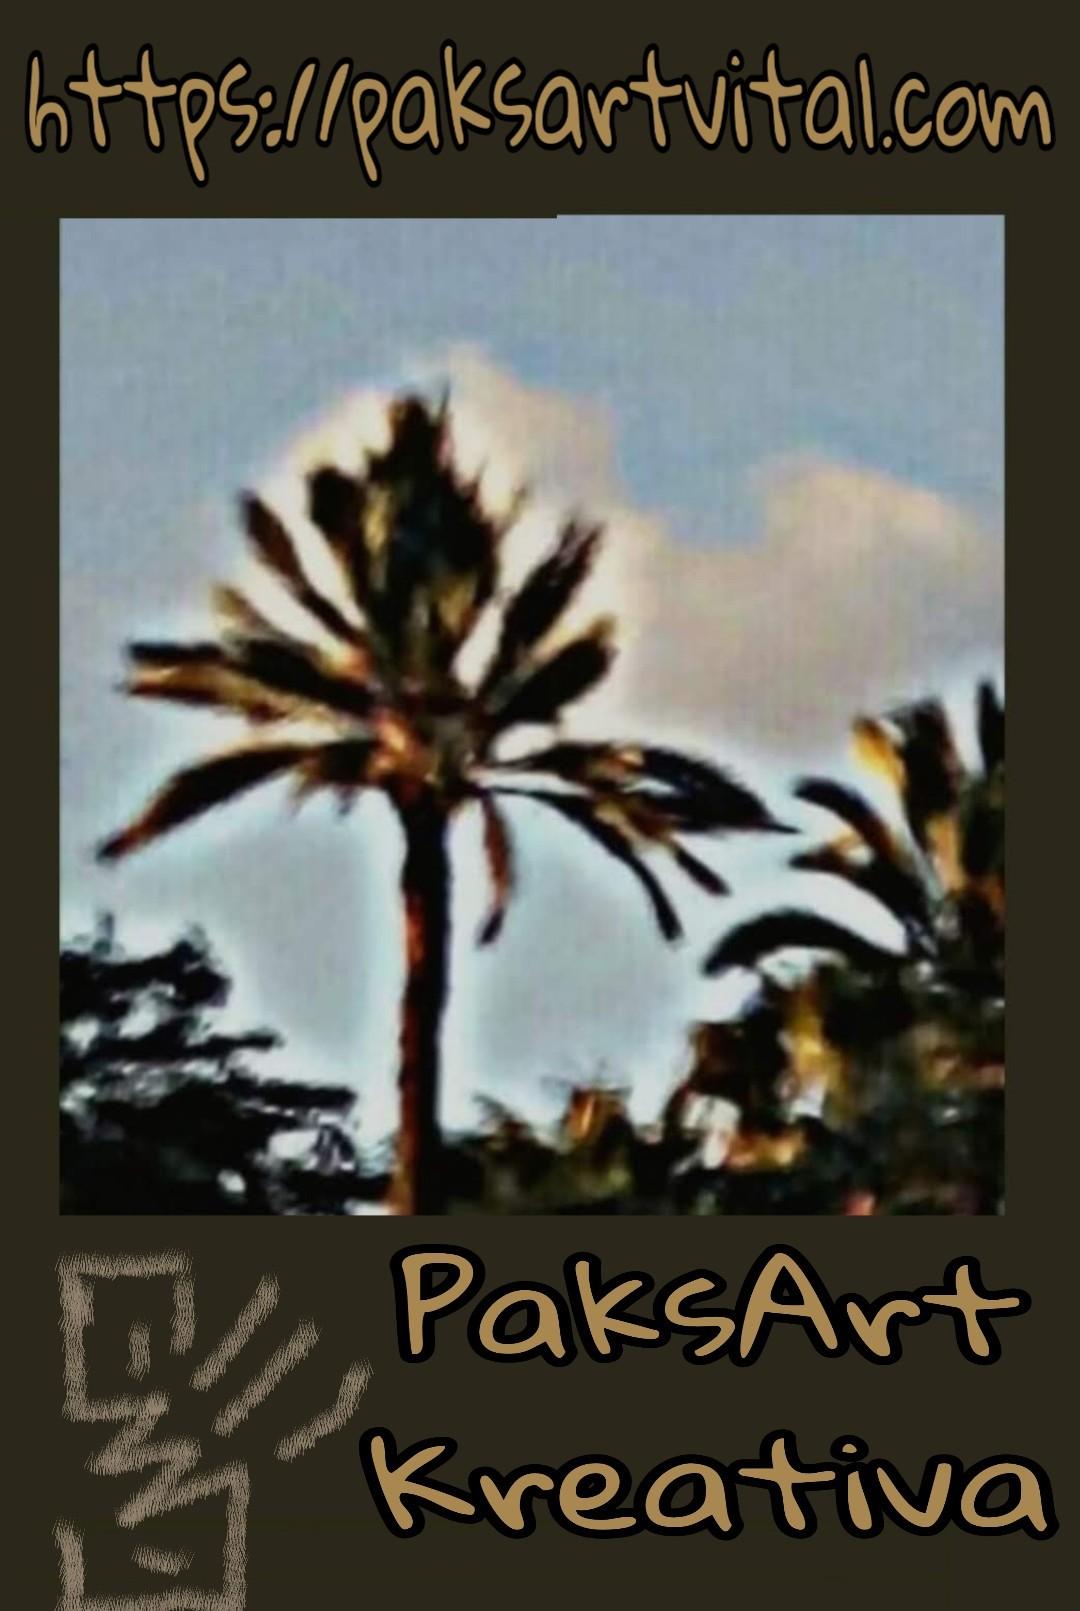 Mundo Kreativo de PaksArt